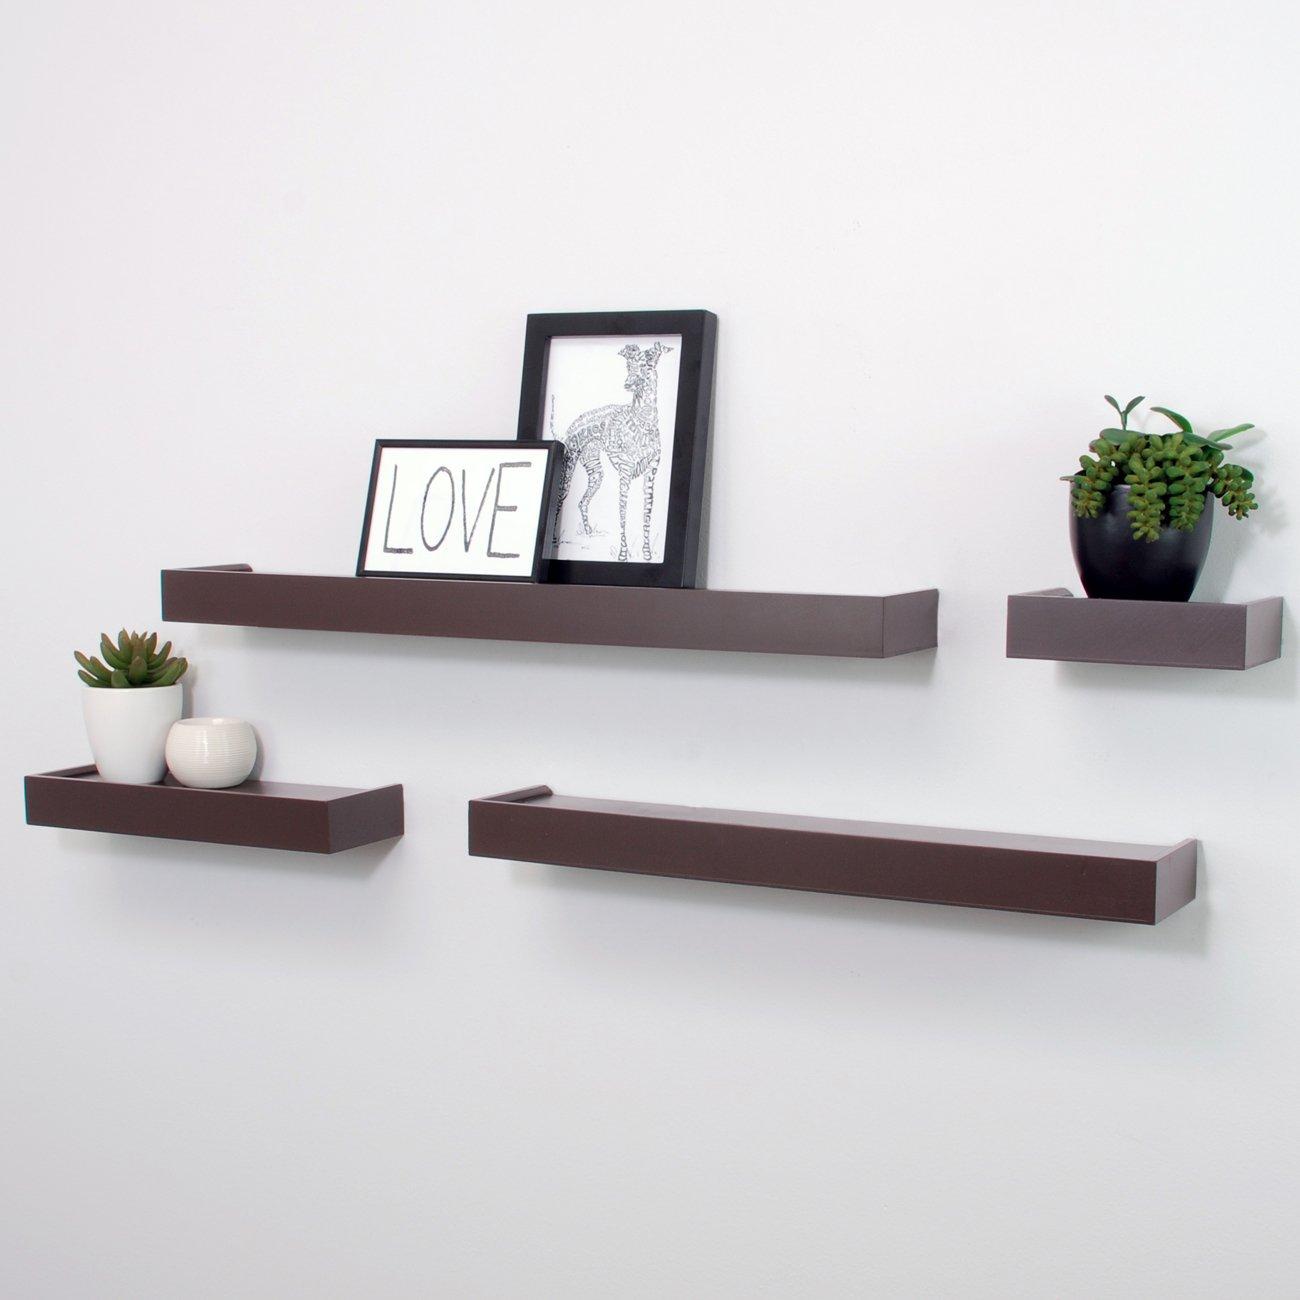 Floating Shelves   Amazon.com